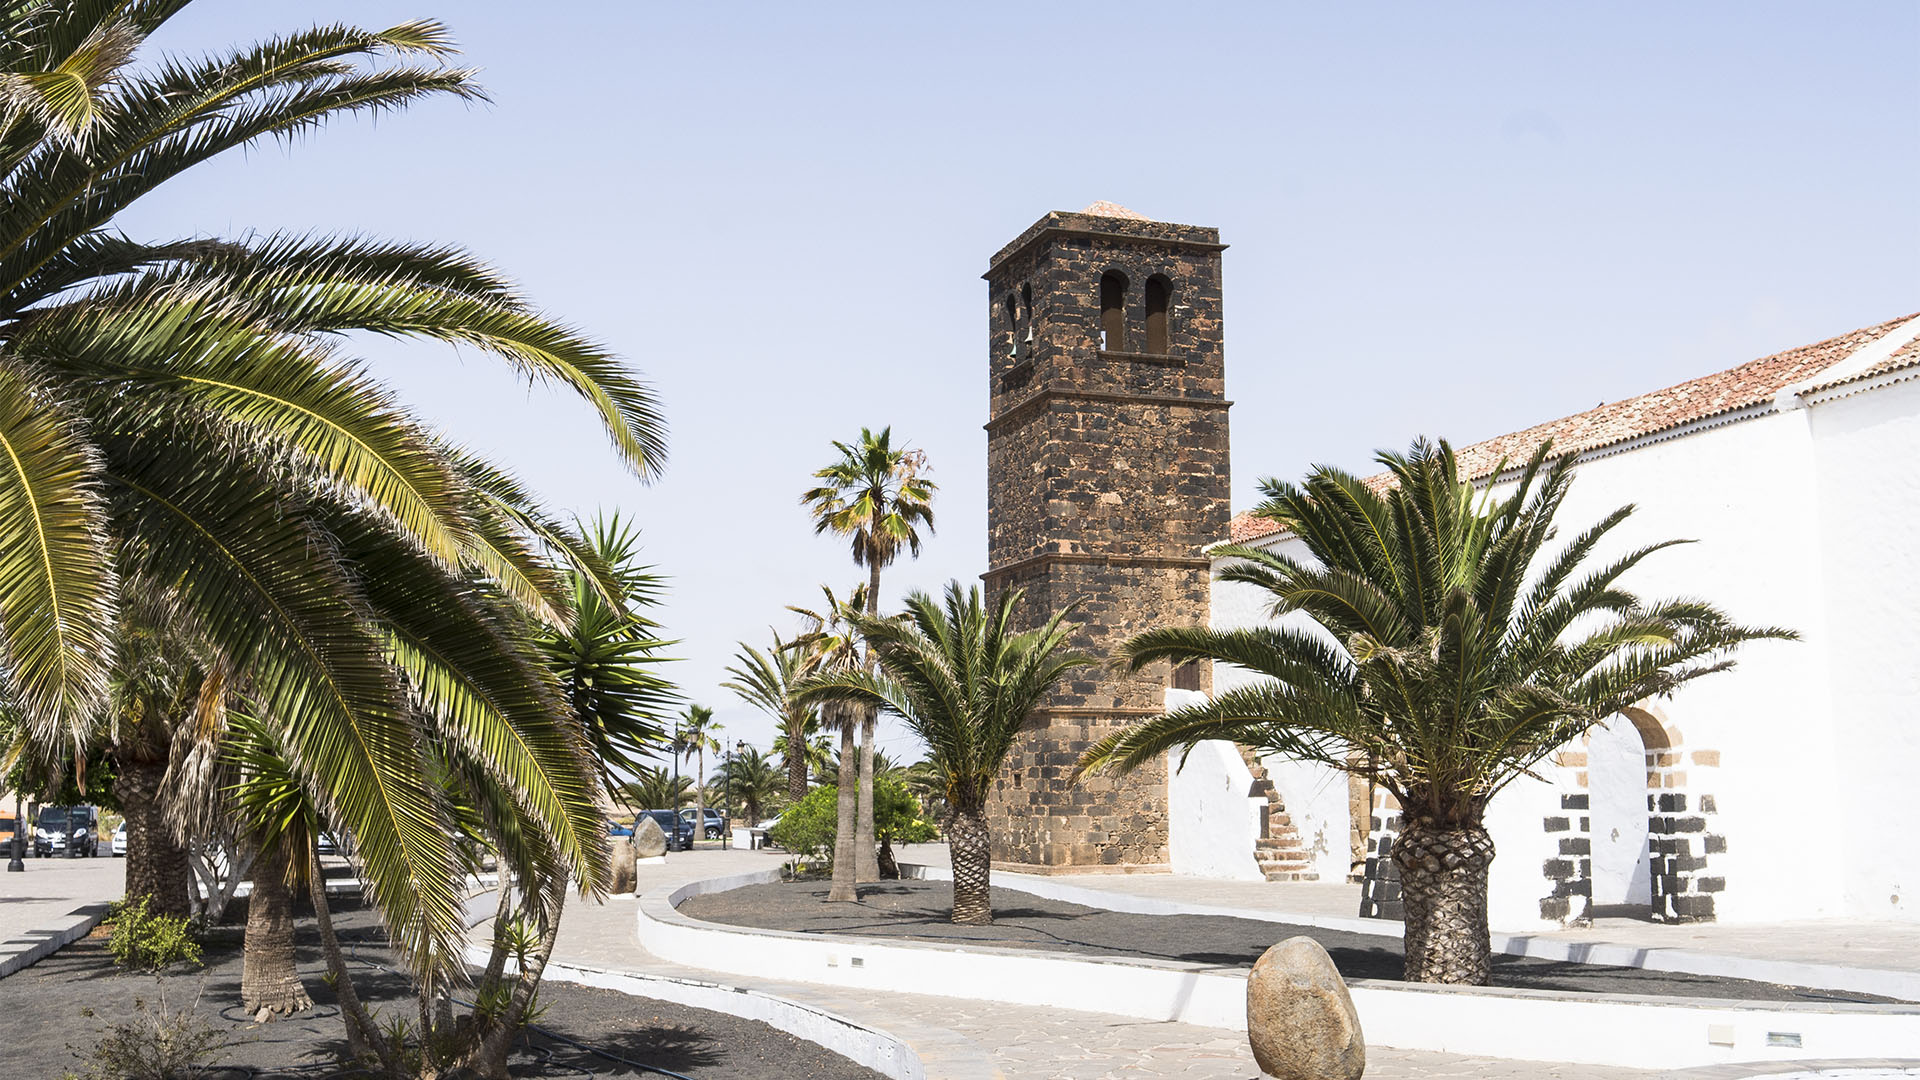 Der Ort La Oliva Fuerteventura: Die Kirche Iglesia Nuestra Señora de la Candelaria.